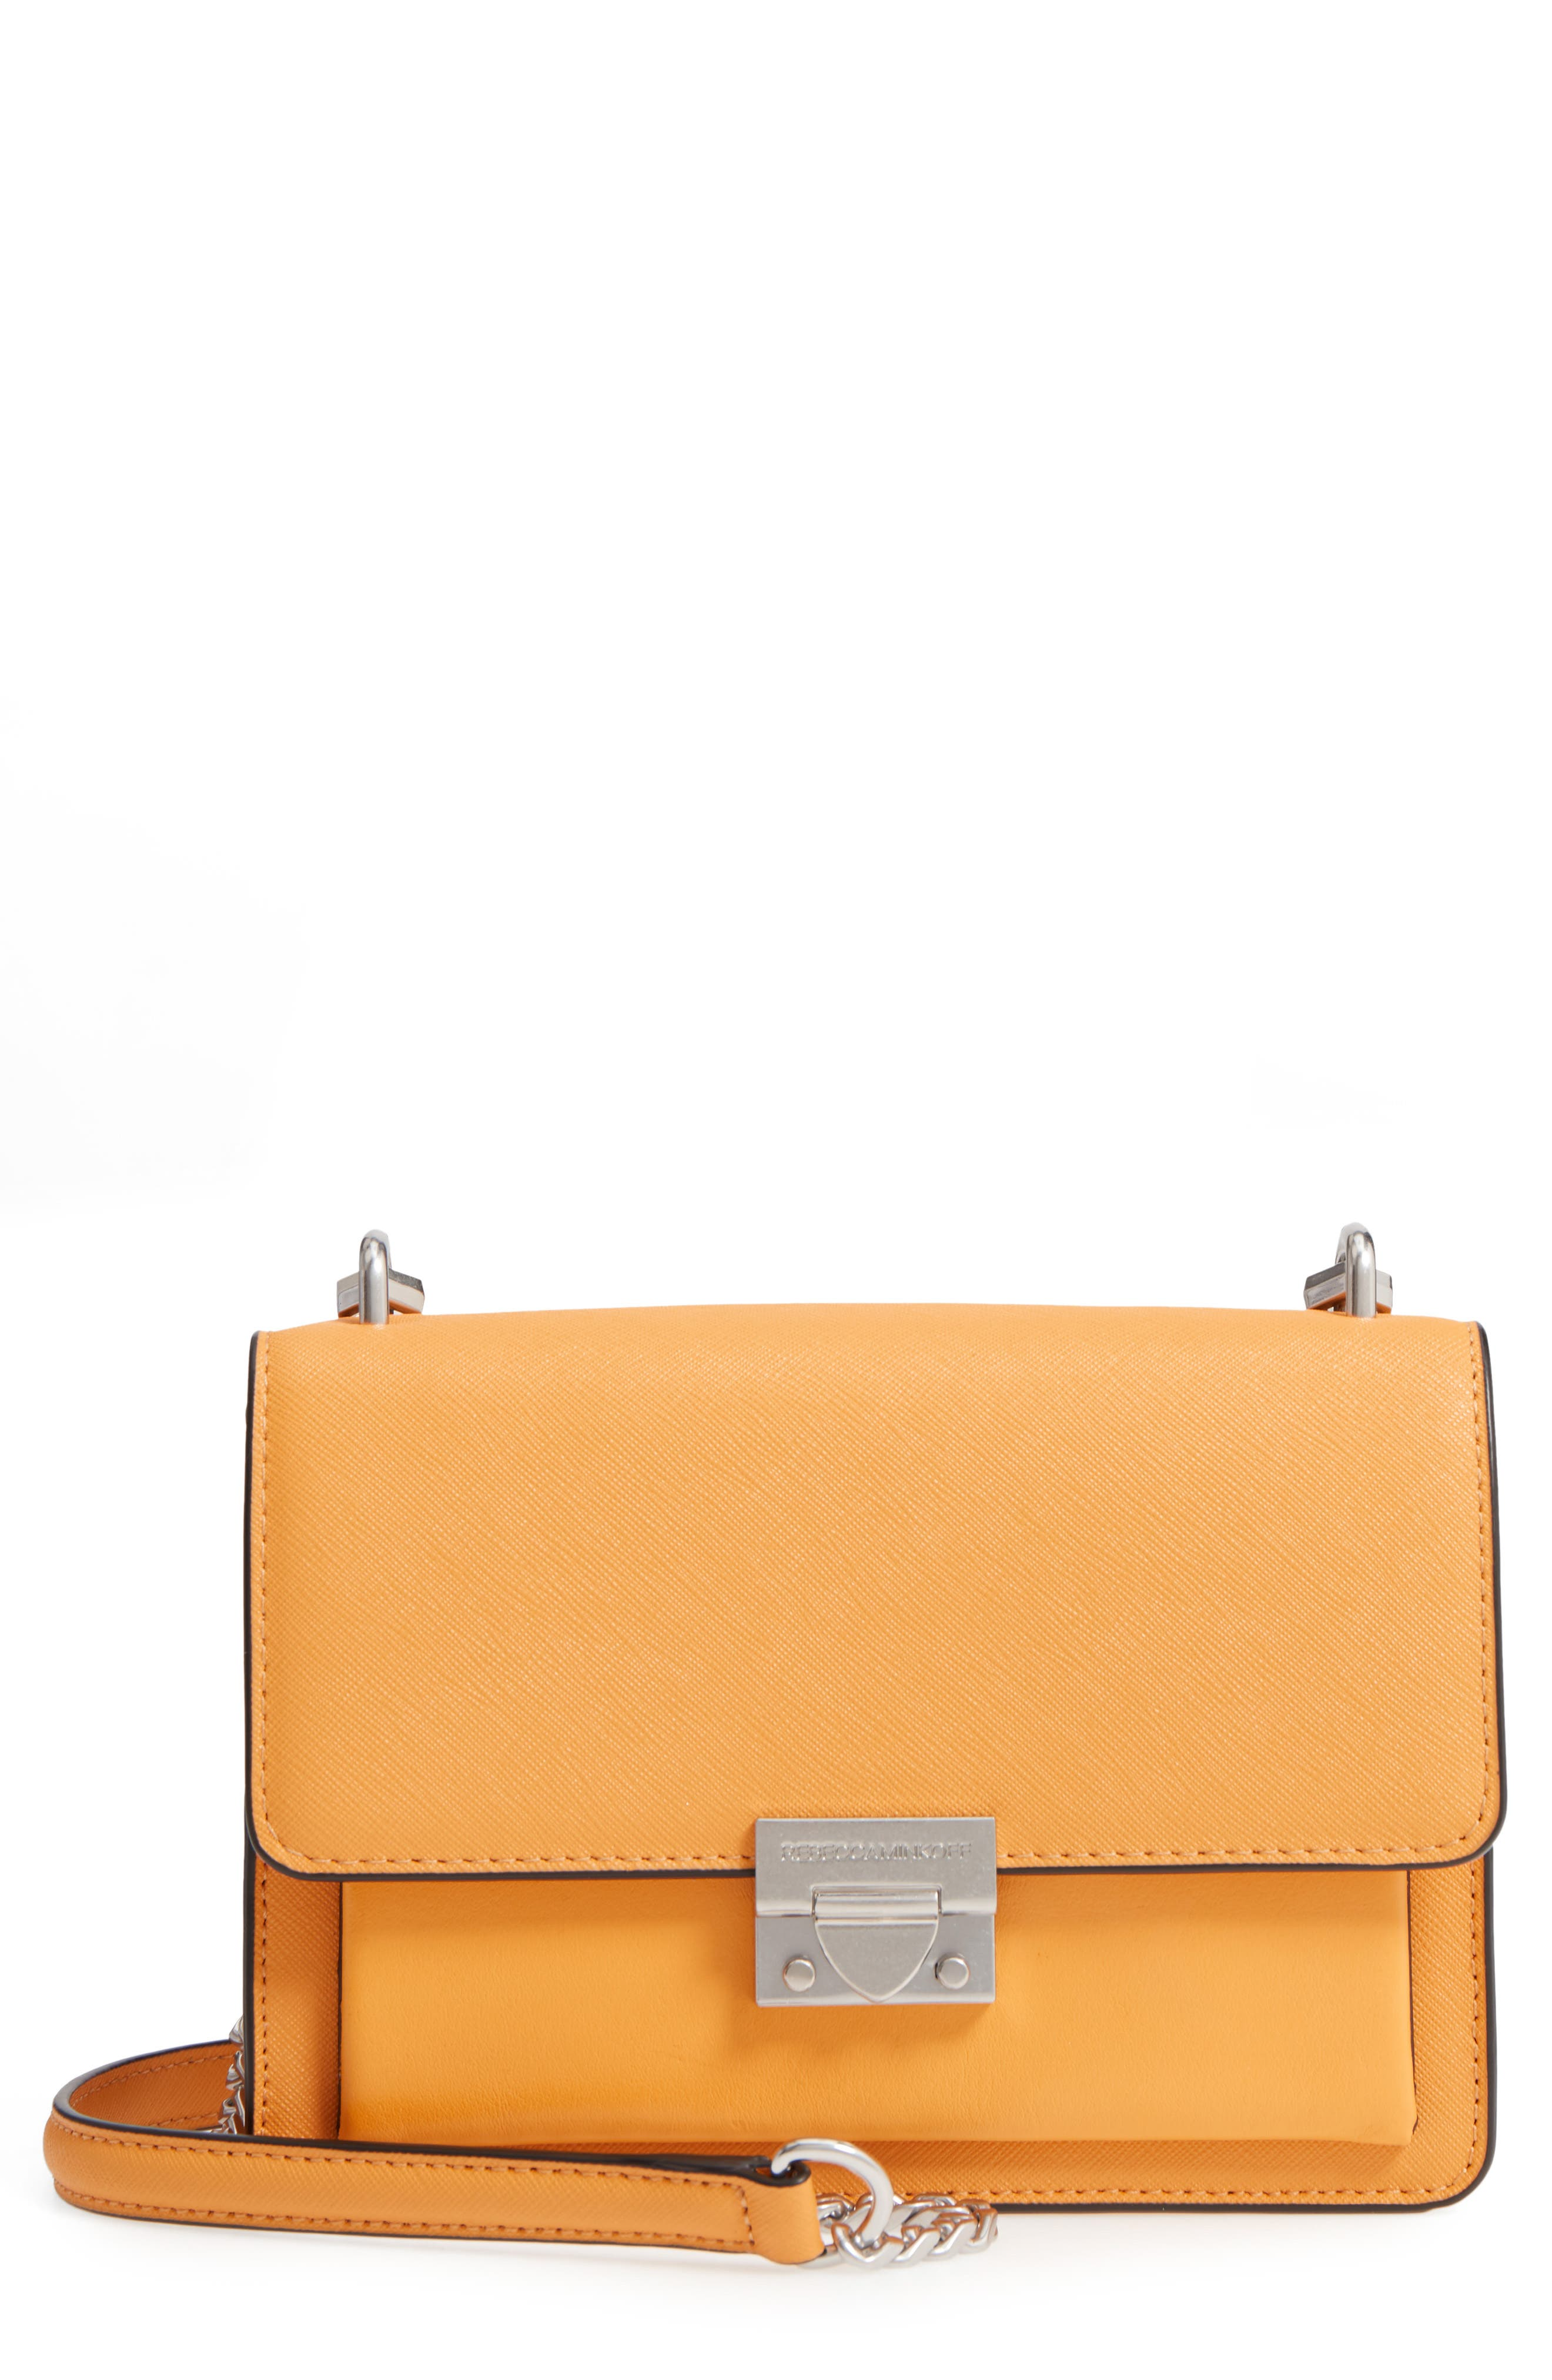 Medium Christy Leather Shoulder Bag,                             Main thumbnail 2, color,